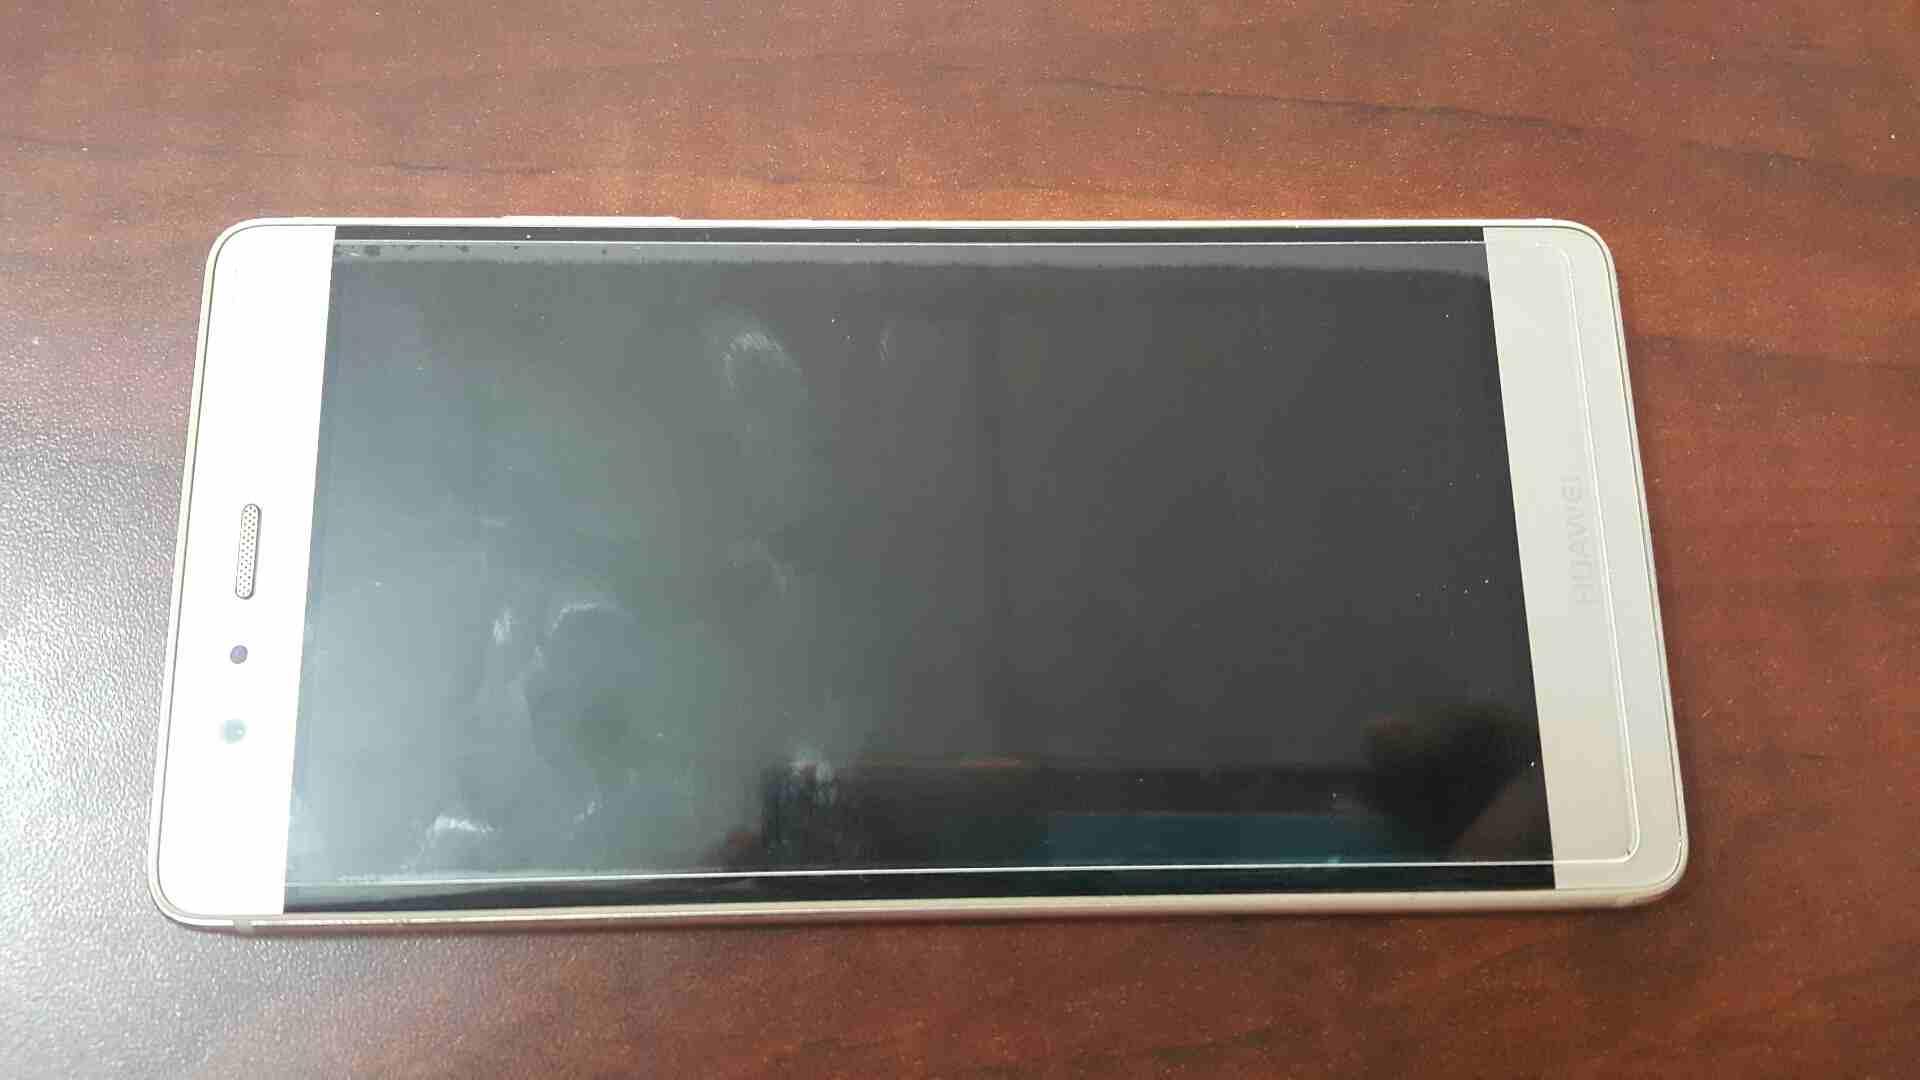 iPhone 11 64GB - $ 650 USDiPhone 11 128GB - $ 710 USDiPhone 11 256GB - $ 770 USDiPhone 11 Pro 64GB - $ 720 USDiPhone 11 Pro 256GB - $ 750 USDiPhone 11 Pro 512GB-  هواوي p9 العادي لا تنسَ...